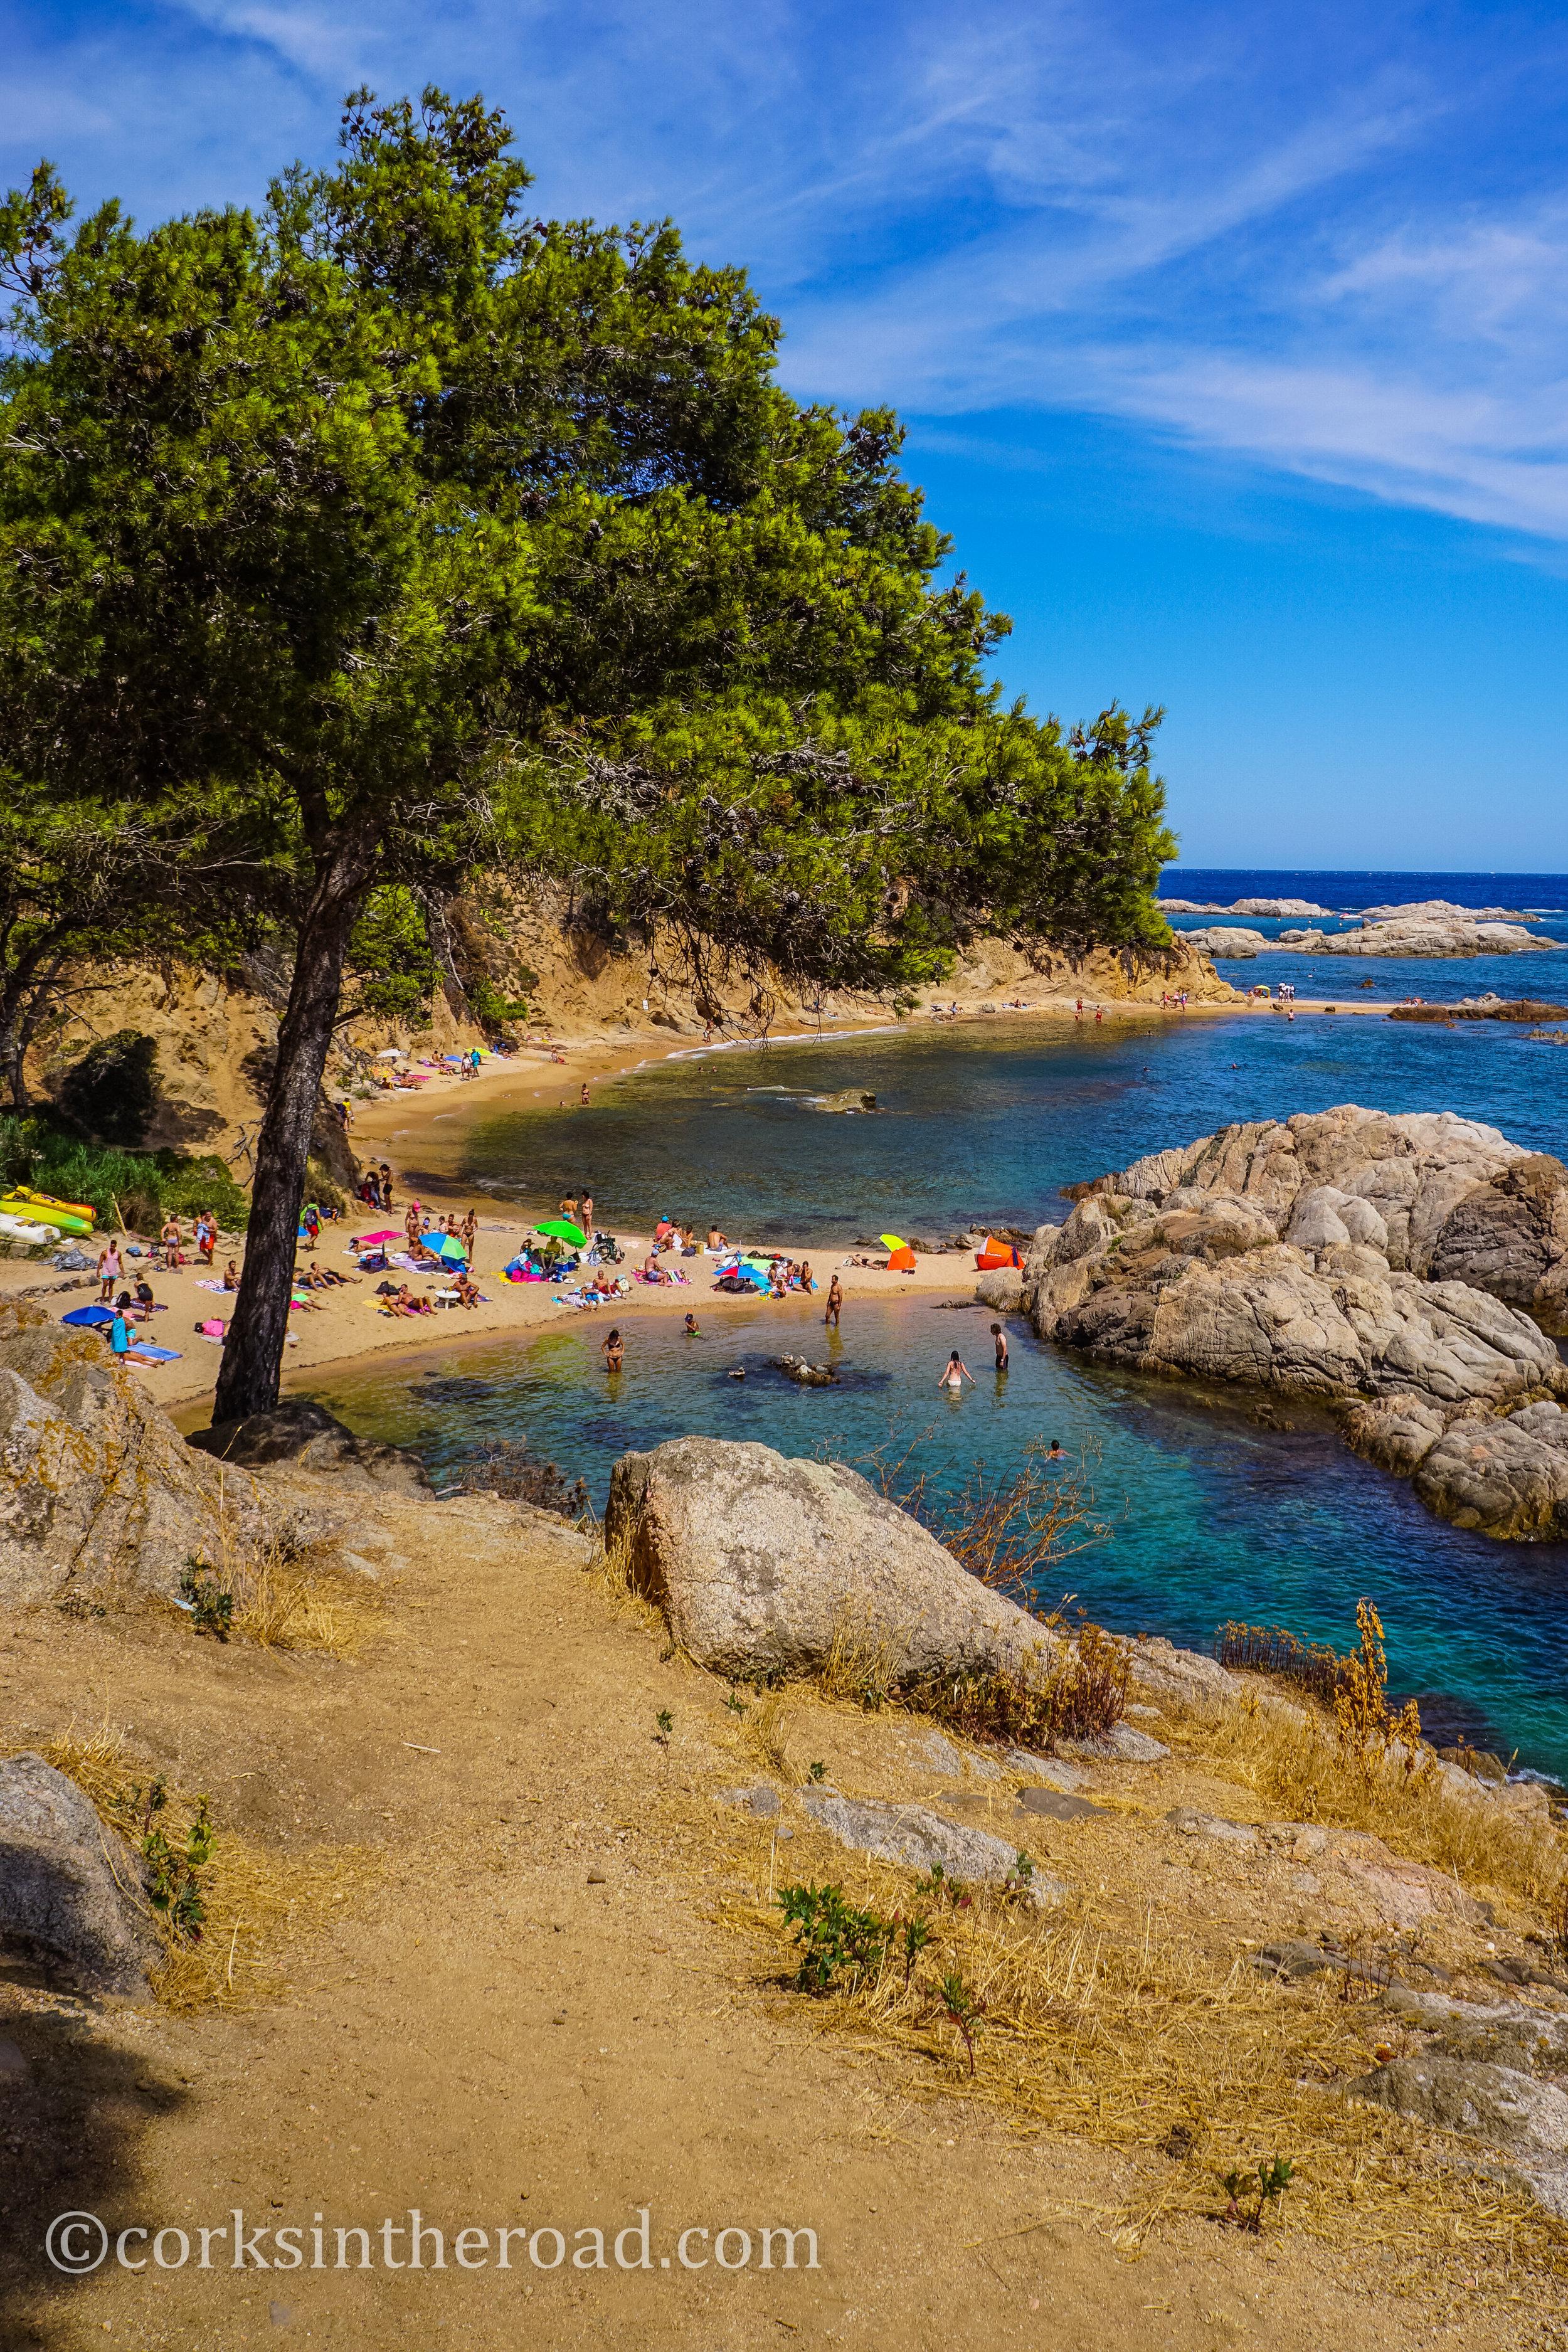 20160810Barcelona, Corksintheroad, Costa Brava, Costa Brava Landscape-45.jpg